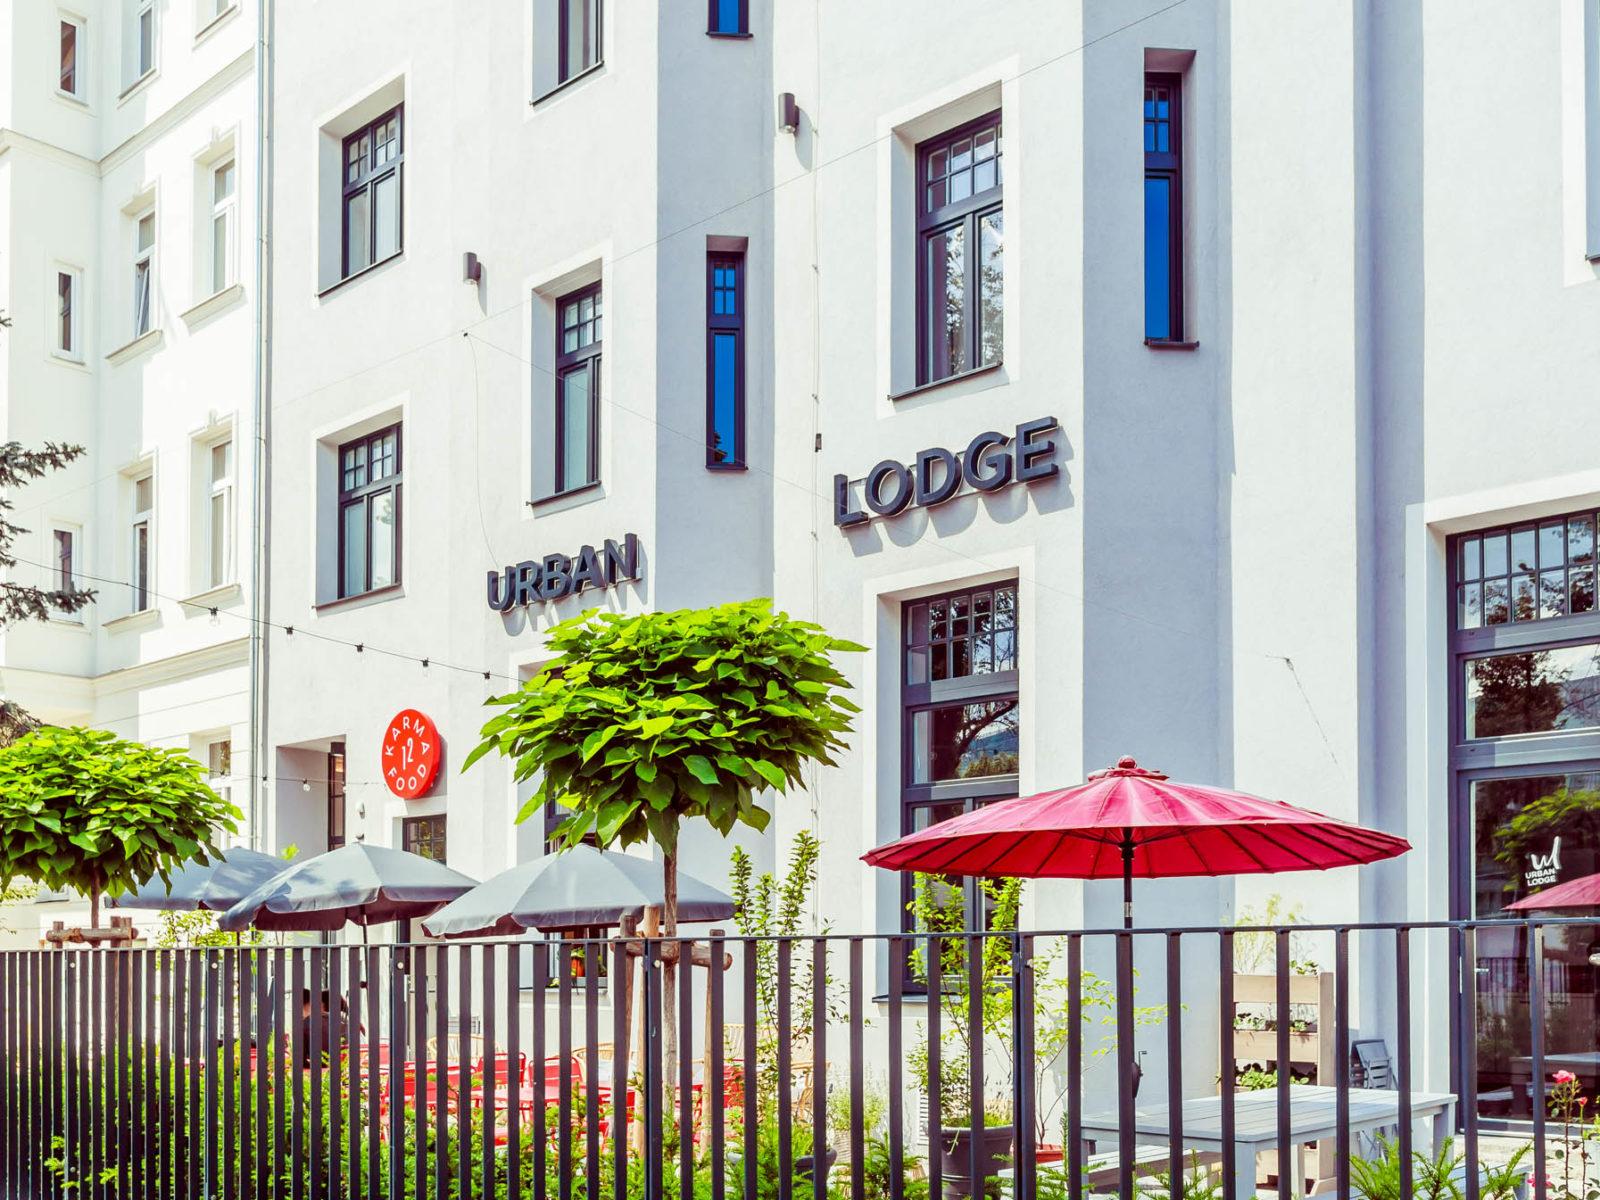 urbanlodge-0006